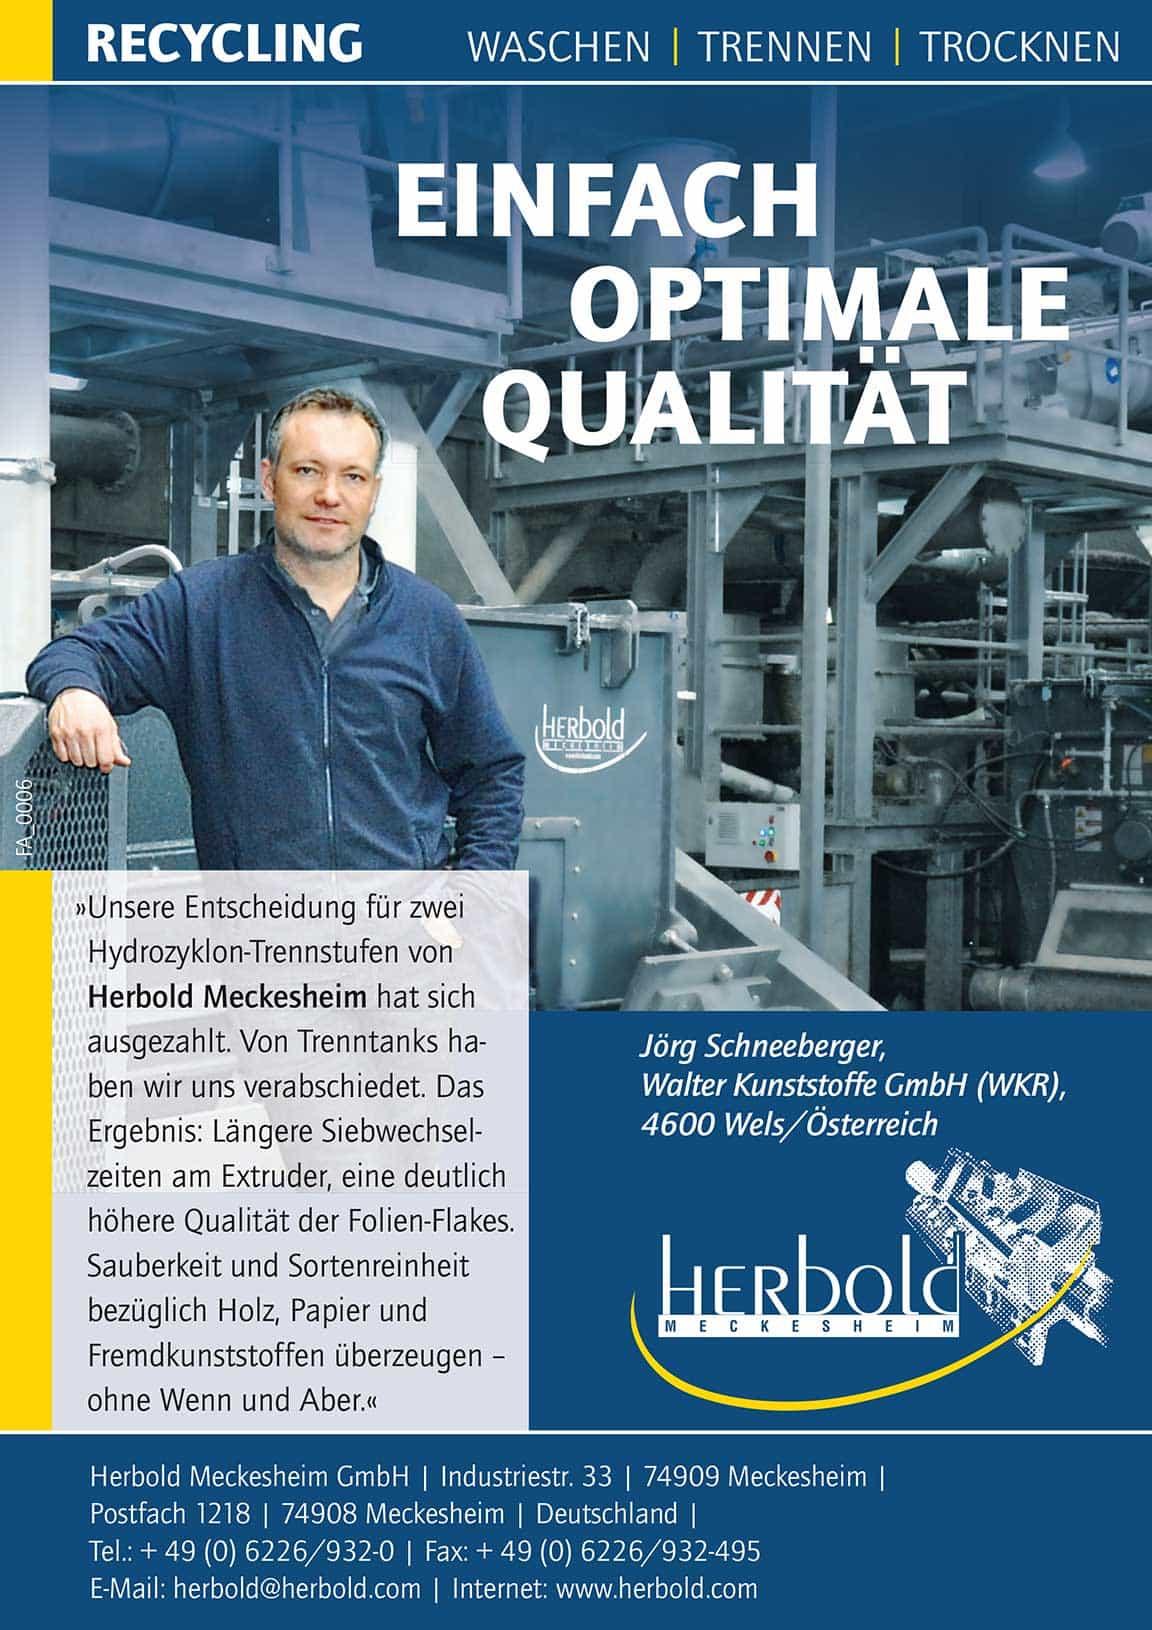 WKR D Testimonial Hydrozyklontrennstufe Herbold Meckesheim - Herbold Meckesheim at the FAKUMA 2017 (17/10/ – 21/10/2017) Hall A6 Stand 6511